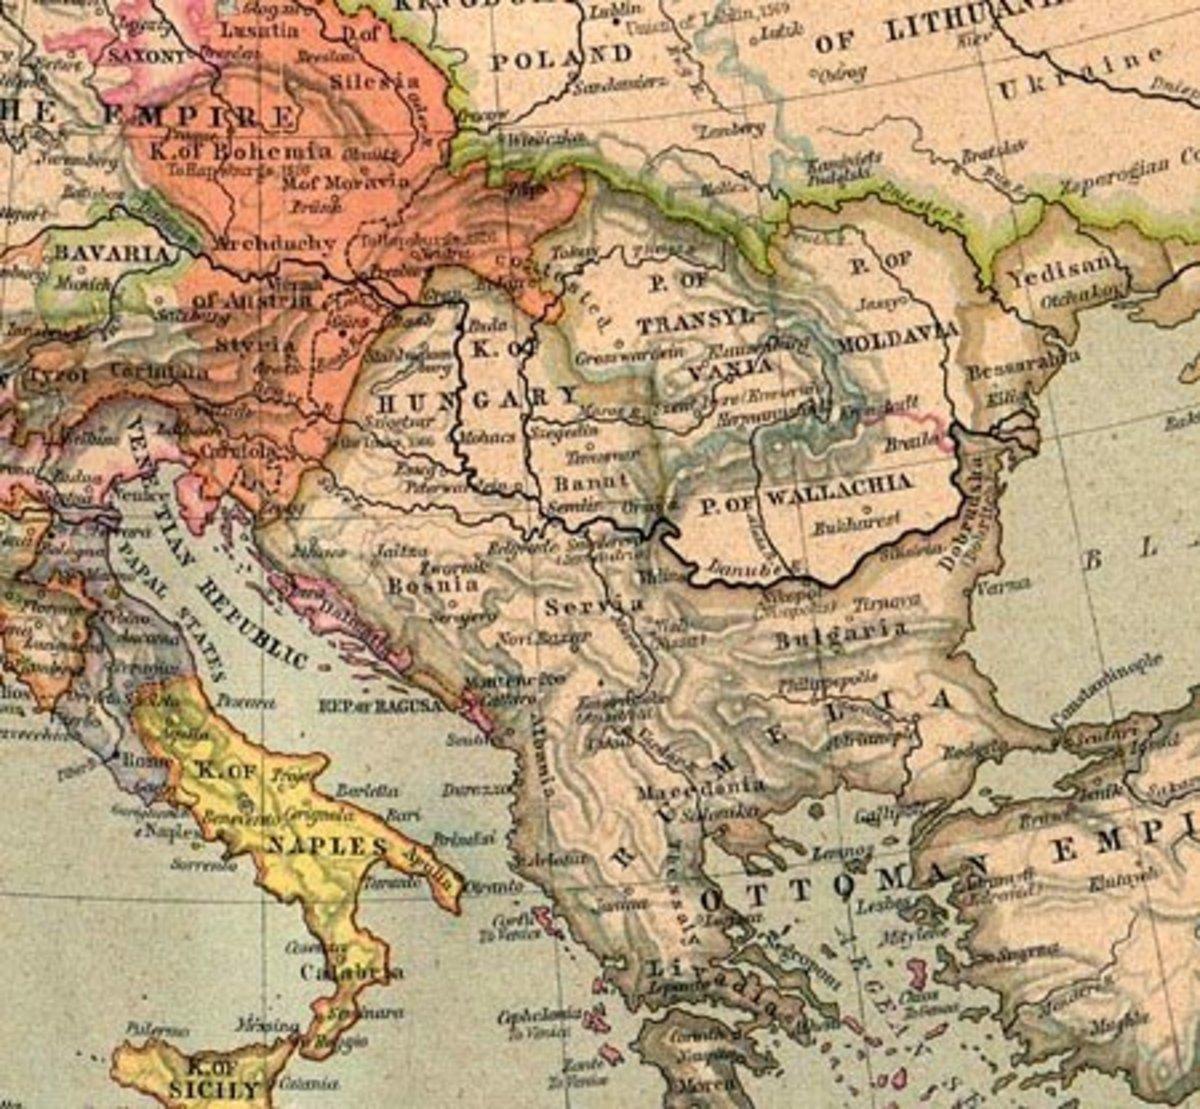 Wallachia and Moldavia became Romania, and Vlad was a Prince of Wallachia